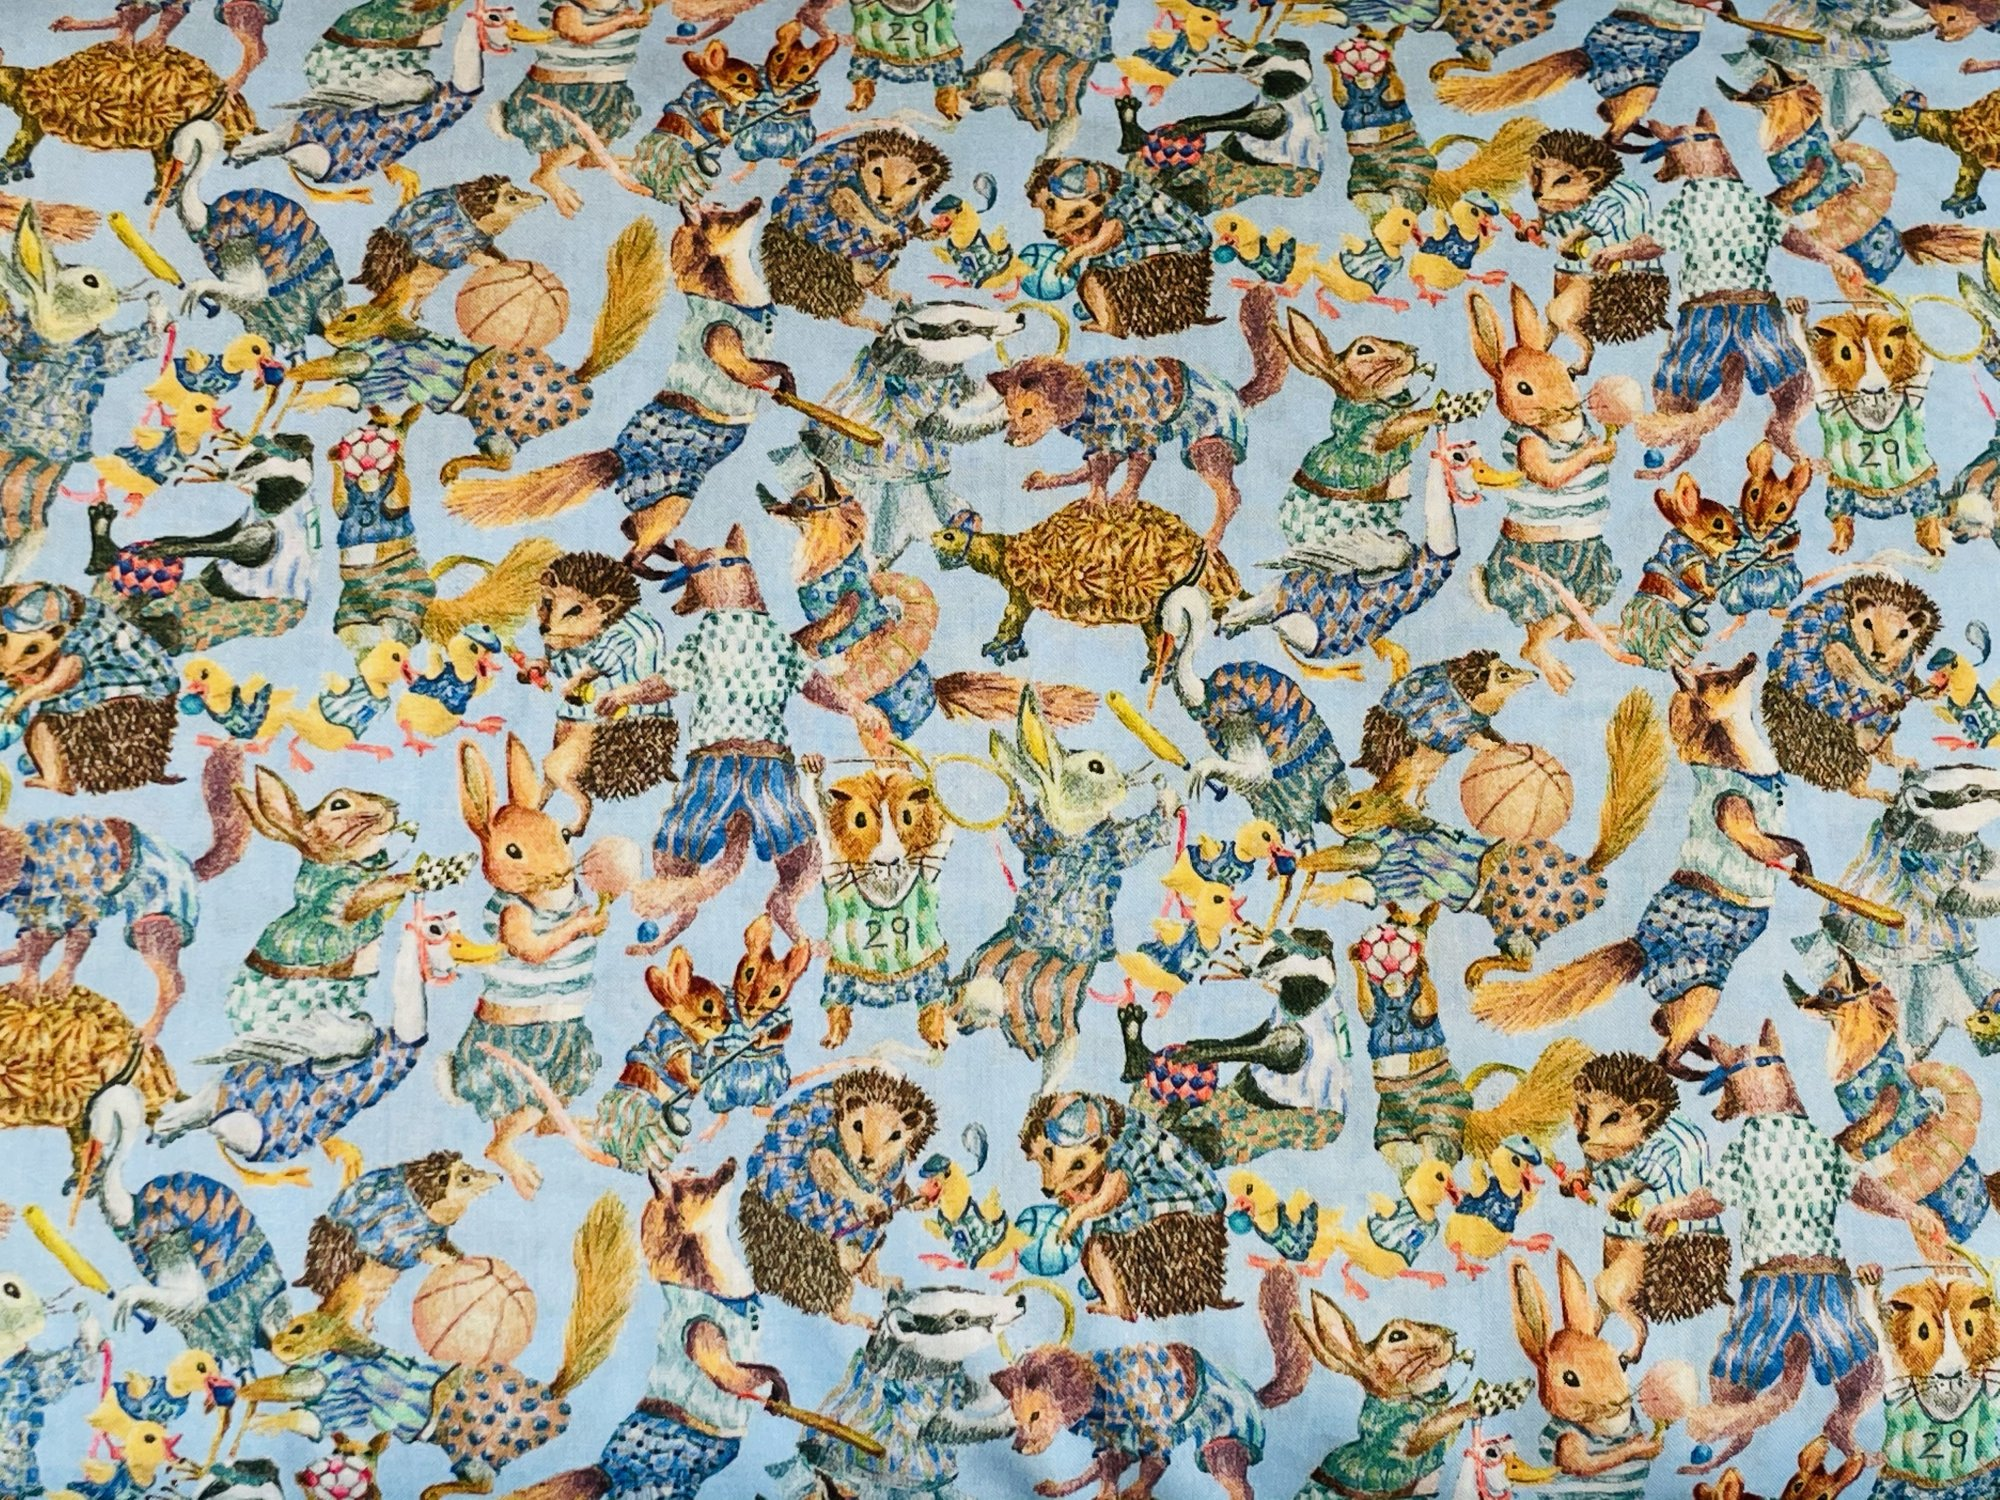 Hullabaloo B Liberty of London Tana Lawn Fabric